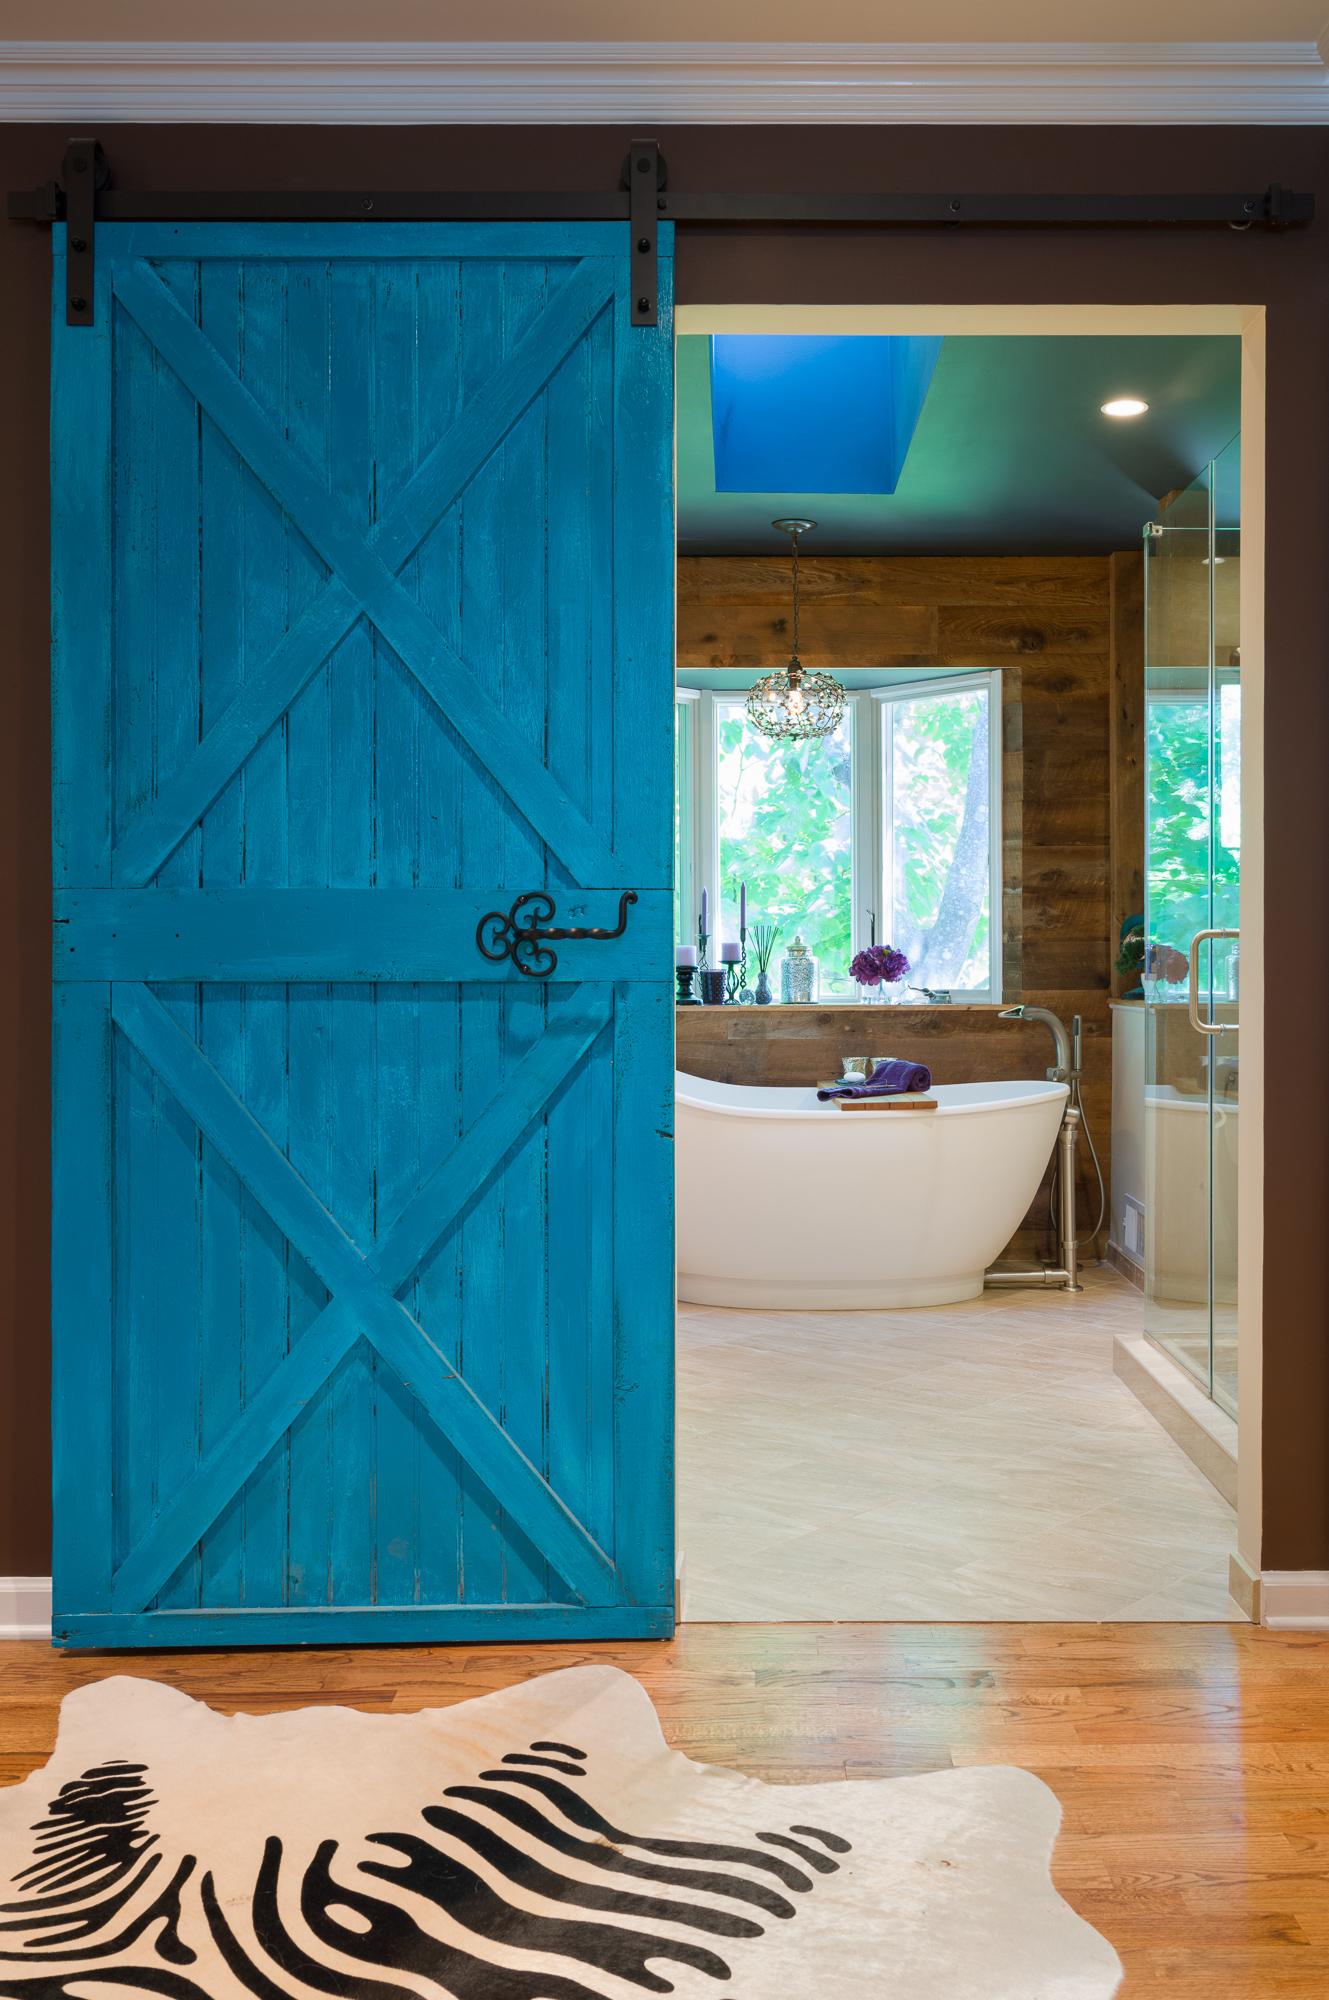 Interior design by Ella Design Group